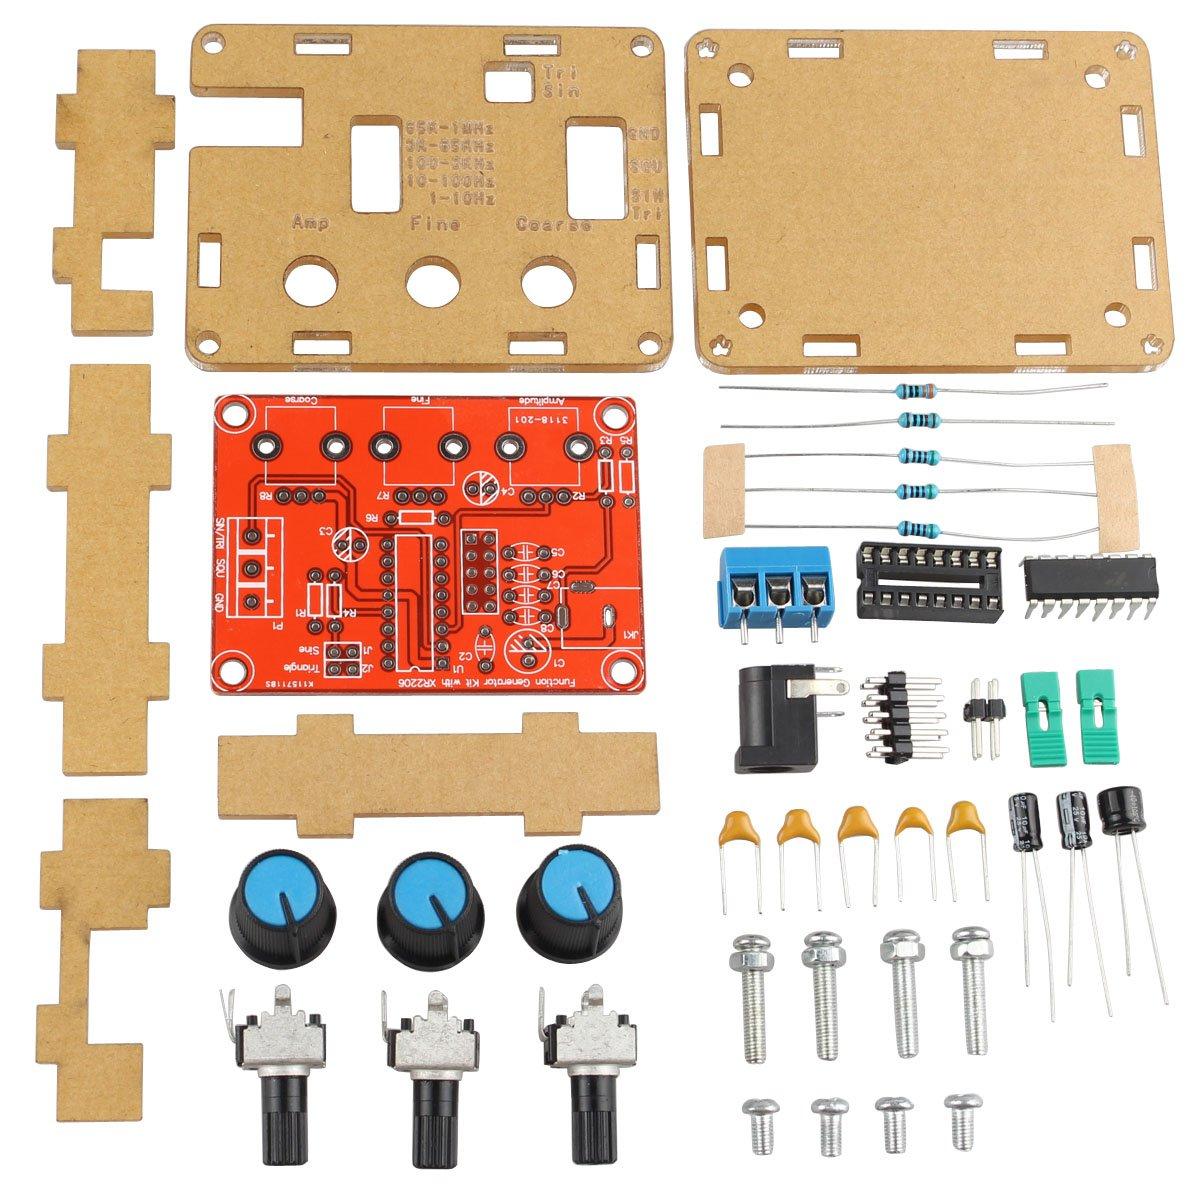 Haljia Xr2206 High Precision Function Signal Generator Circuit Car Tuning Electronics